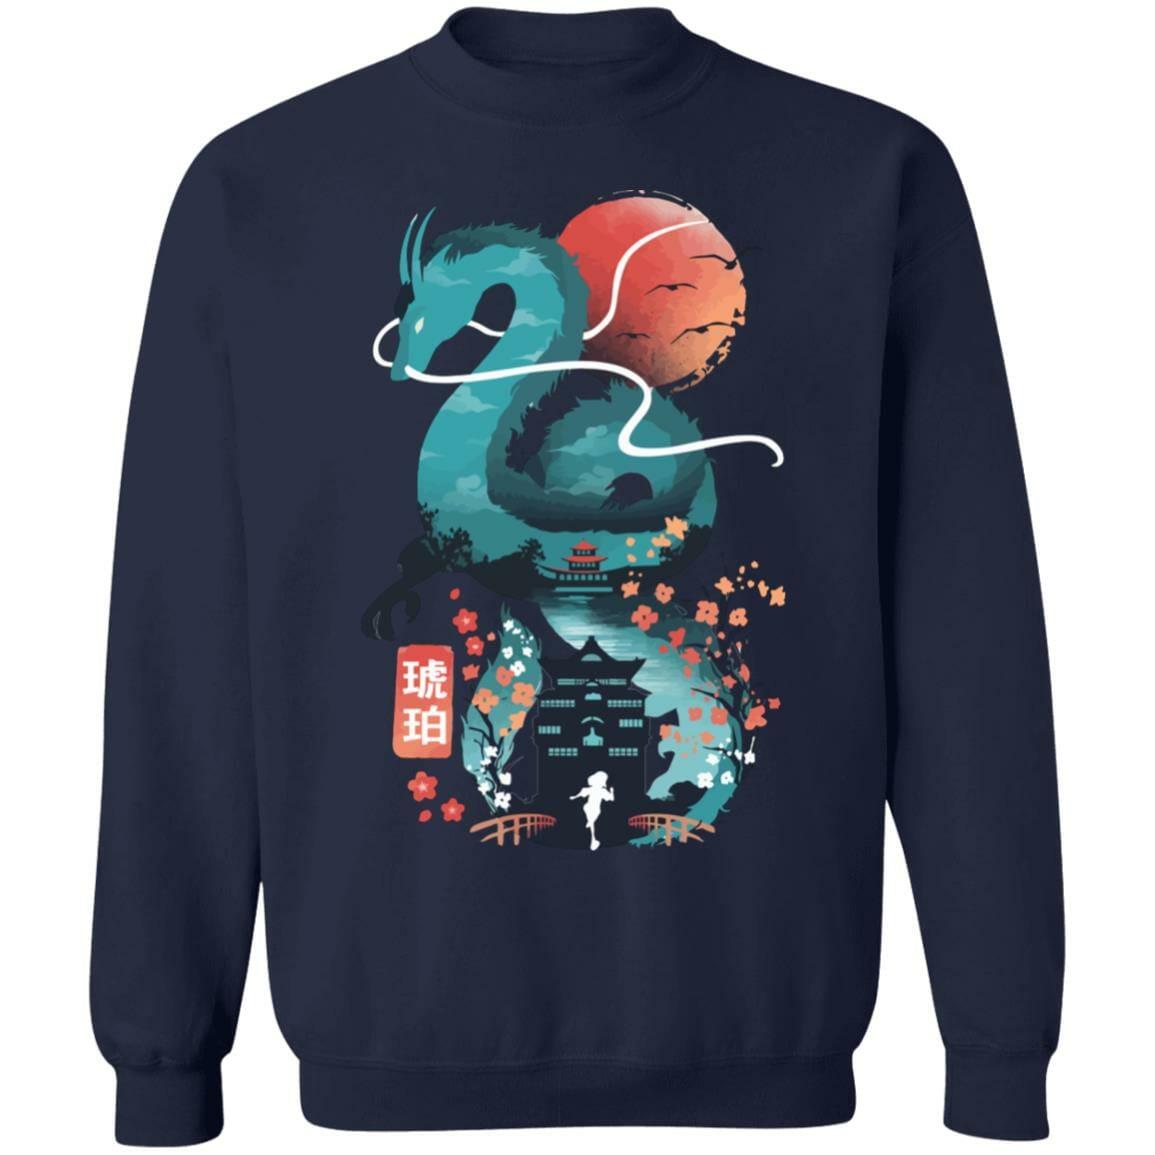 Spirited Away – Haku Dragon and The Bathhouse Classic Sweatshirt